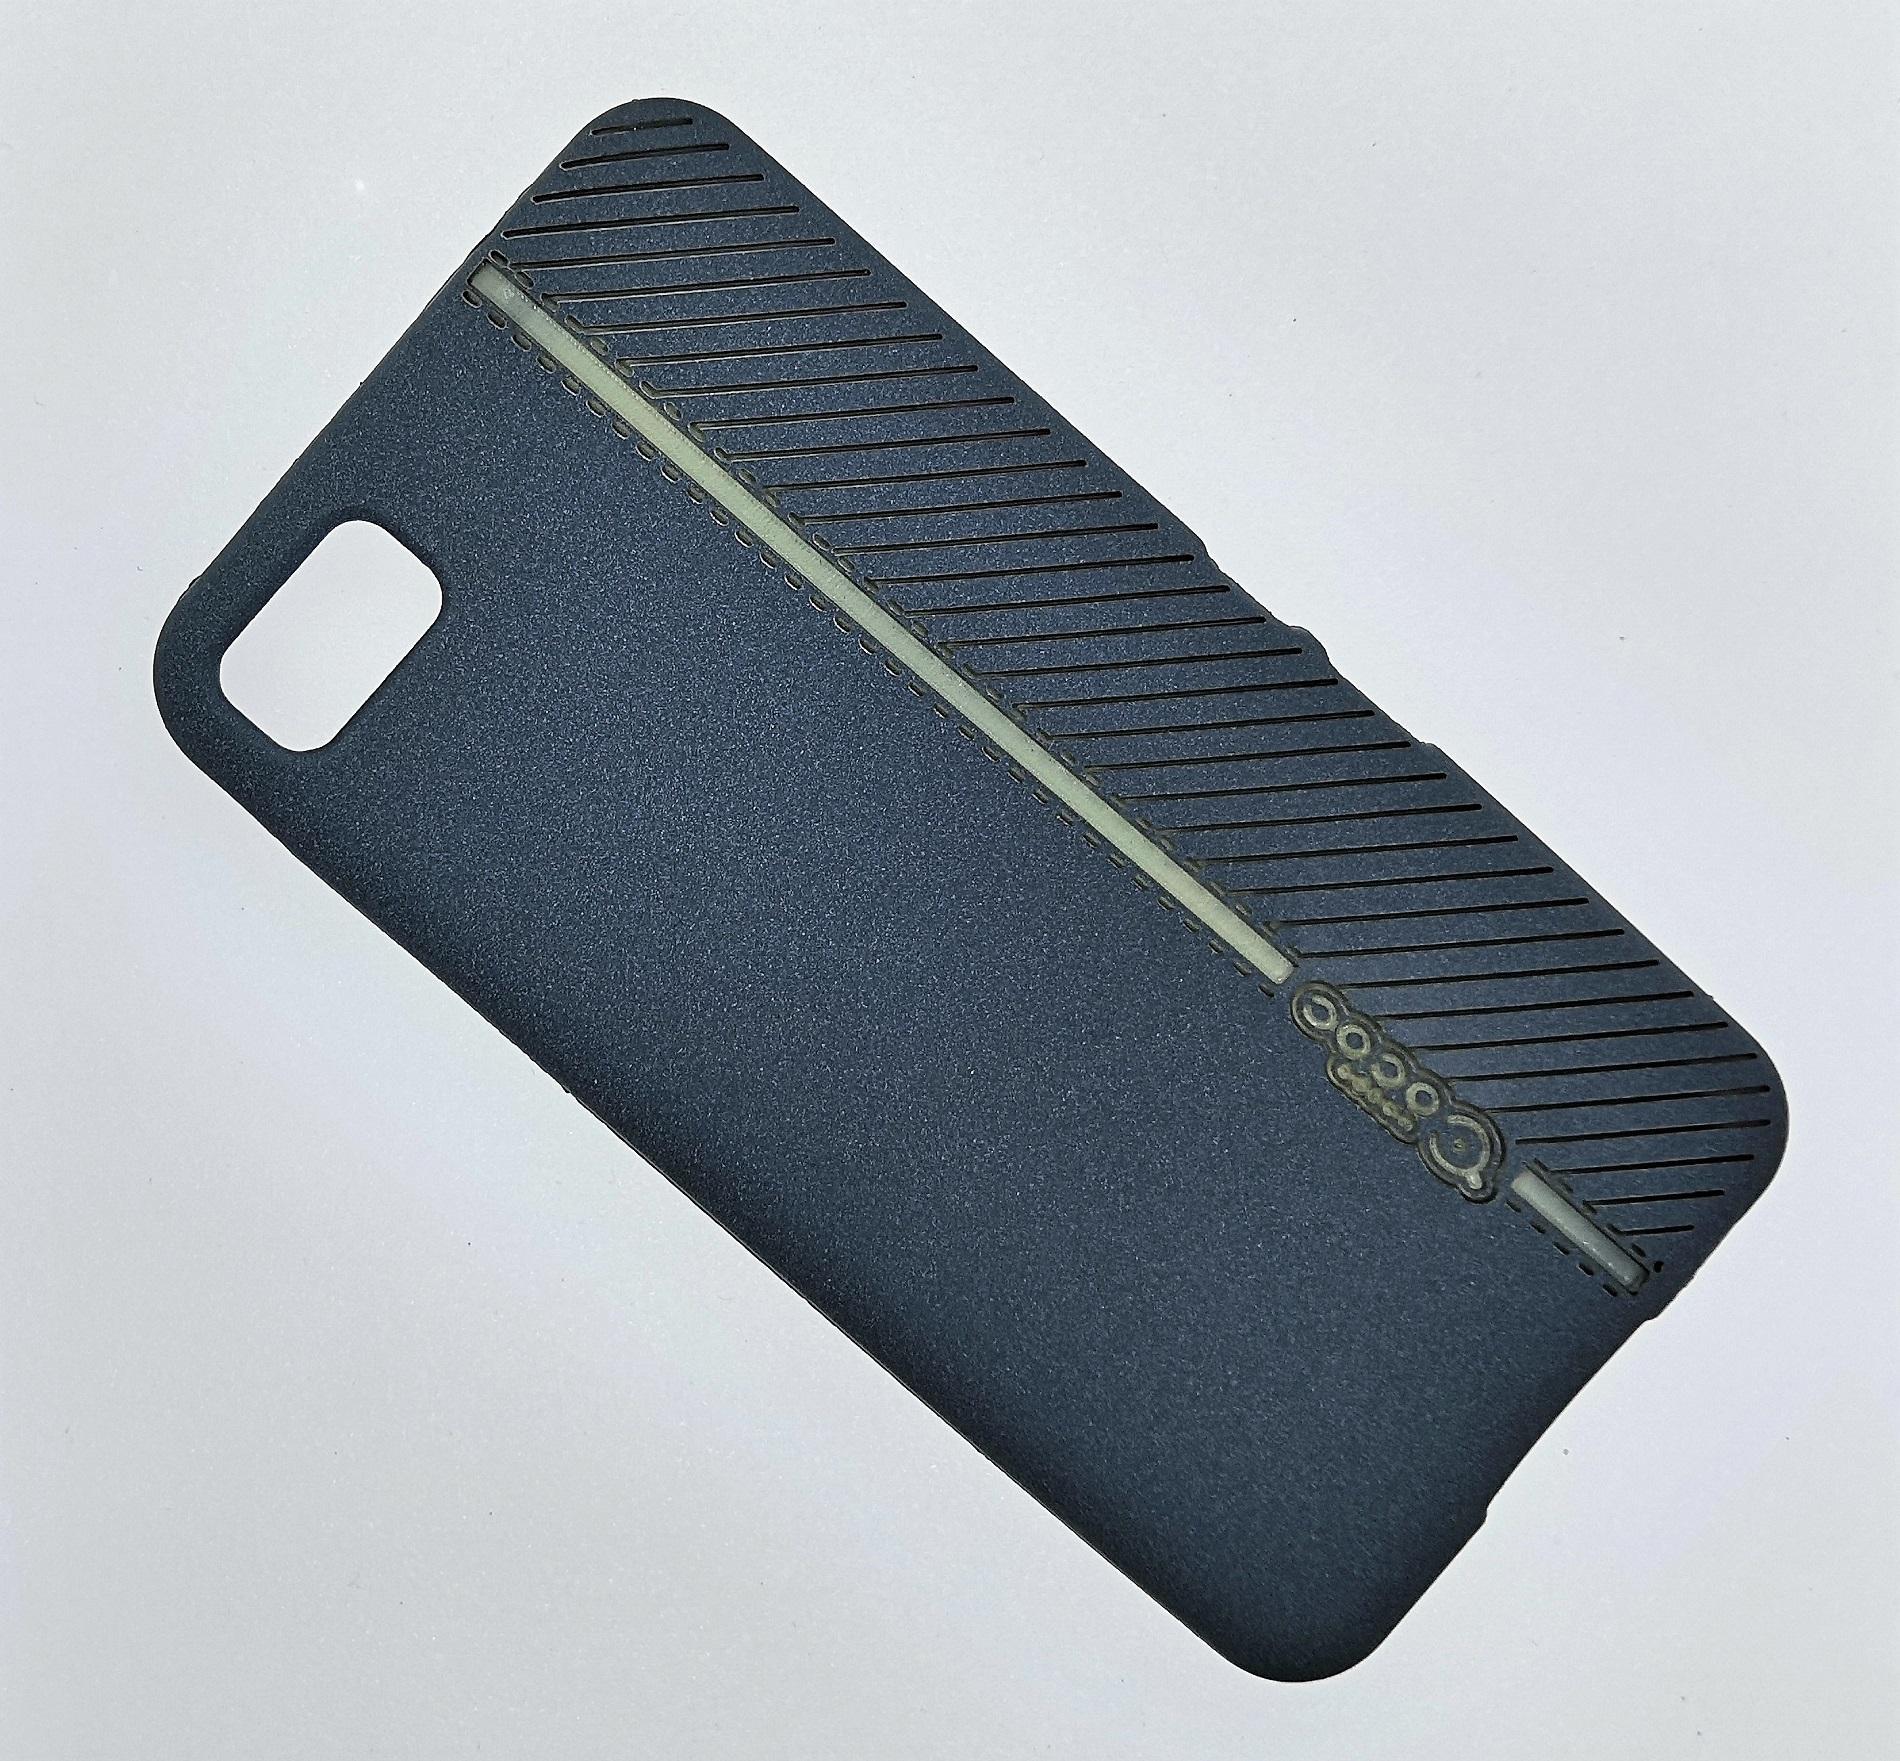 BlackBerry Z10 COCOC Slim Leather Case - Leather Case